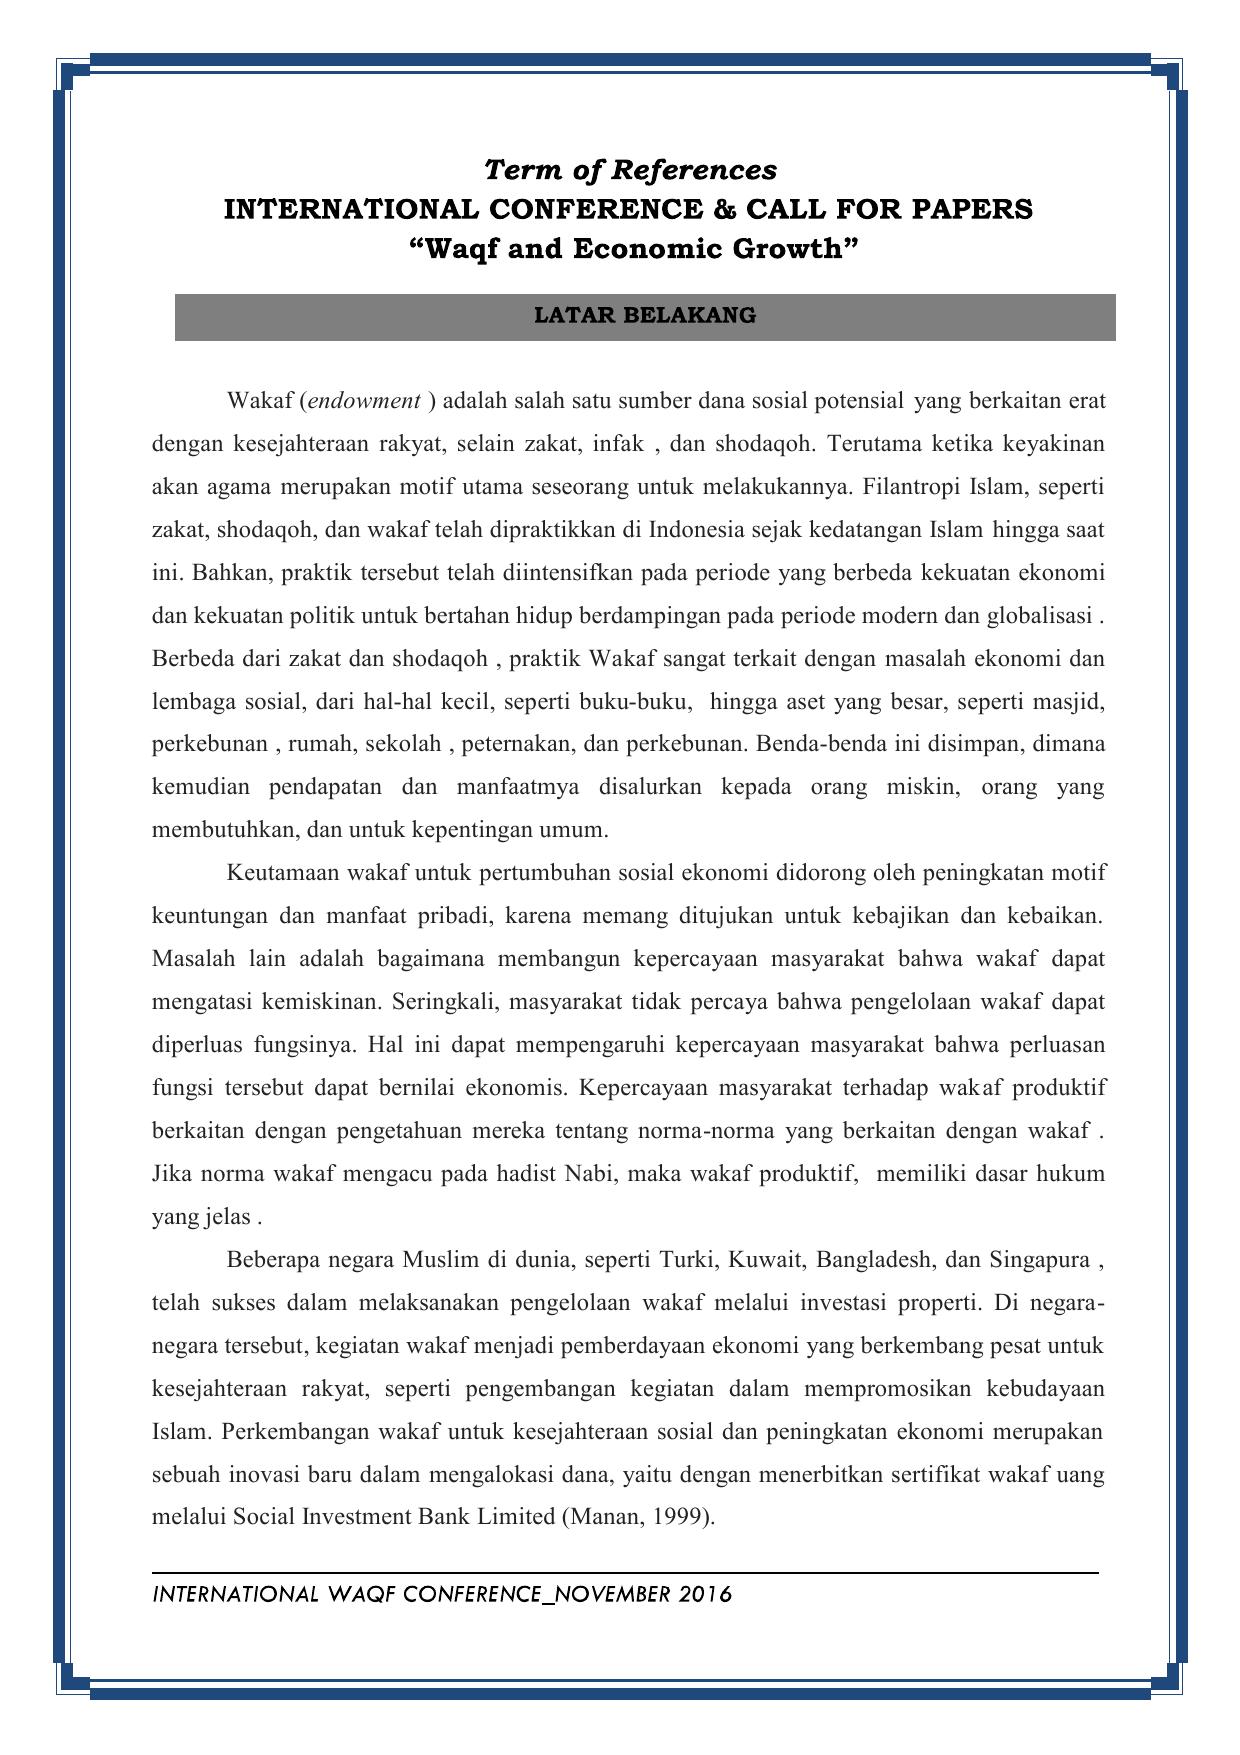 Contoh Skripsi Wakaf Contoh Soal Dan Materi Pelajaran 8